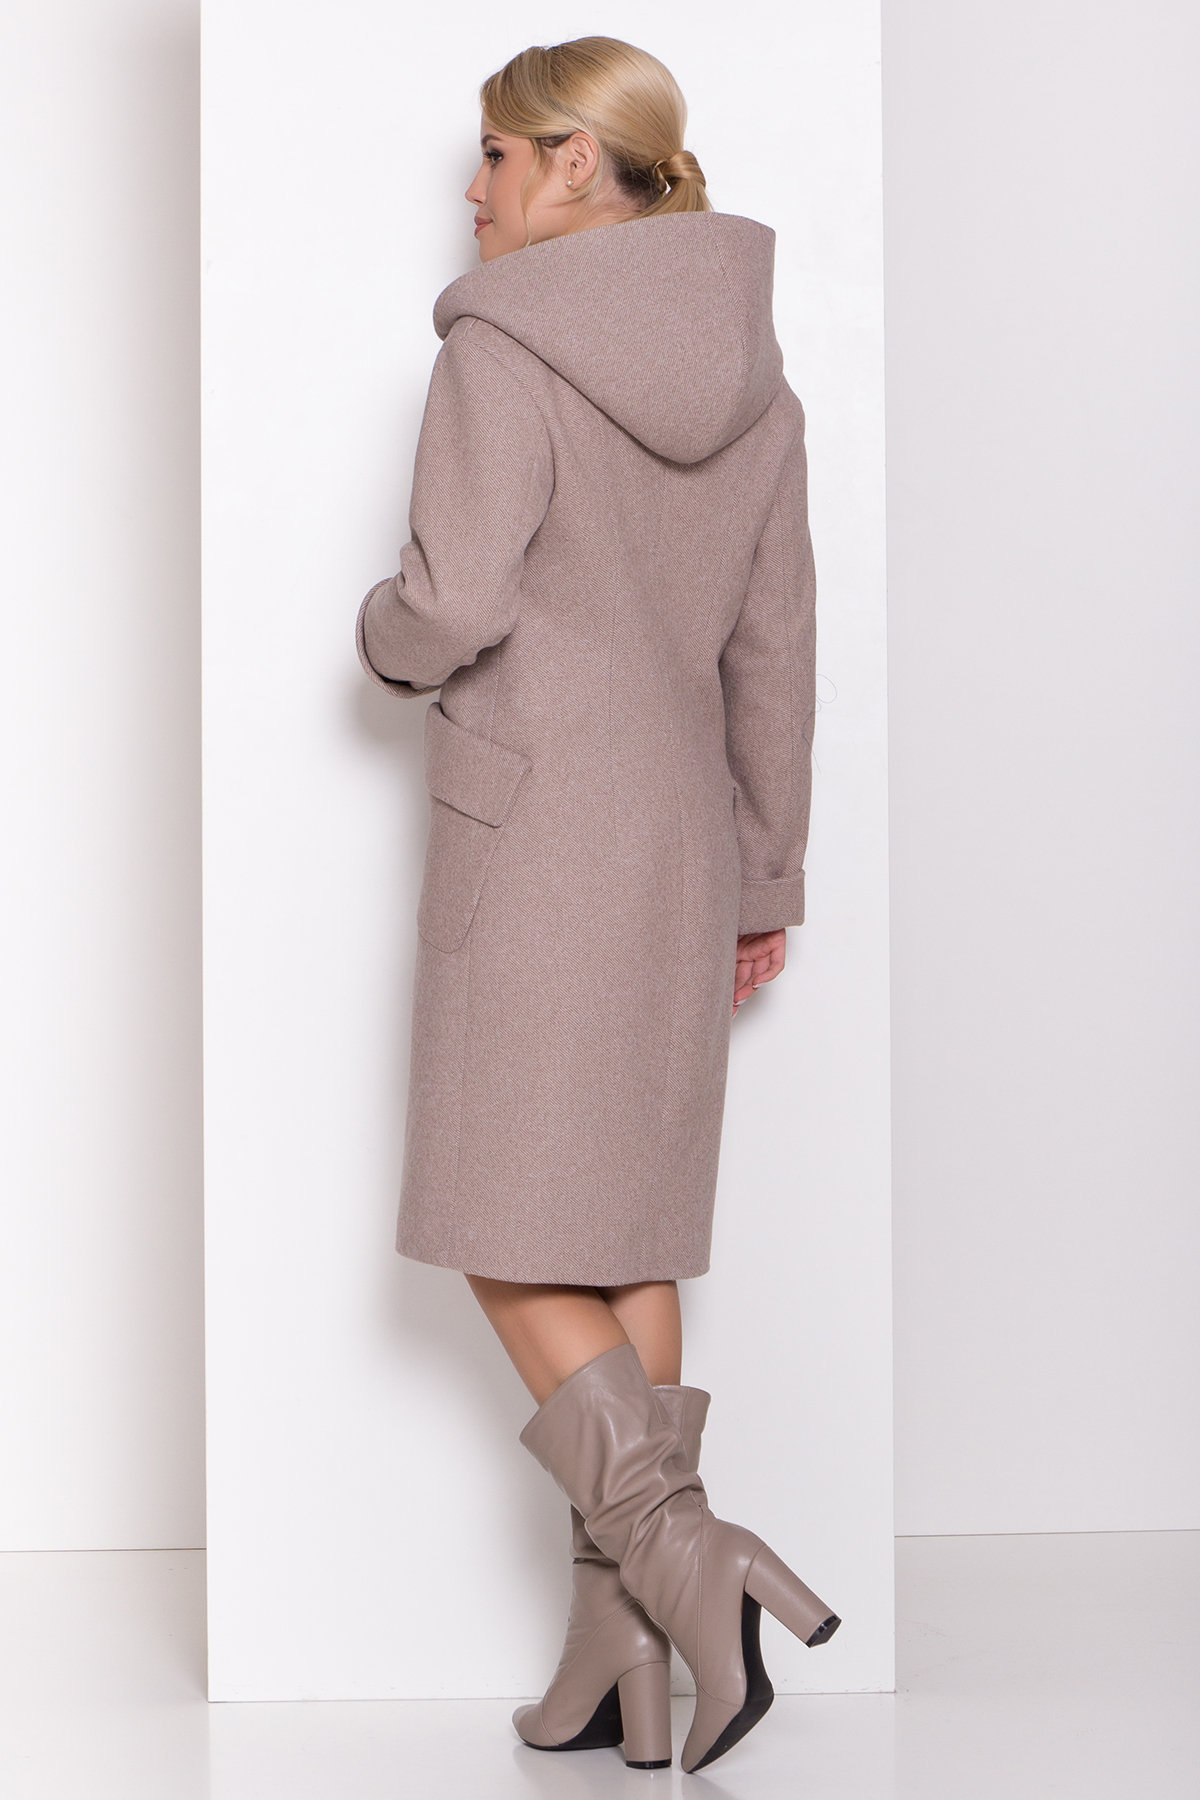 Пальто зима Анджи 8455 АРТ. 44727 Цвет: Бежевый меланж - фото 4, интернет магазин tm-modus.ru